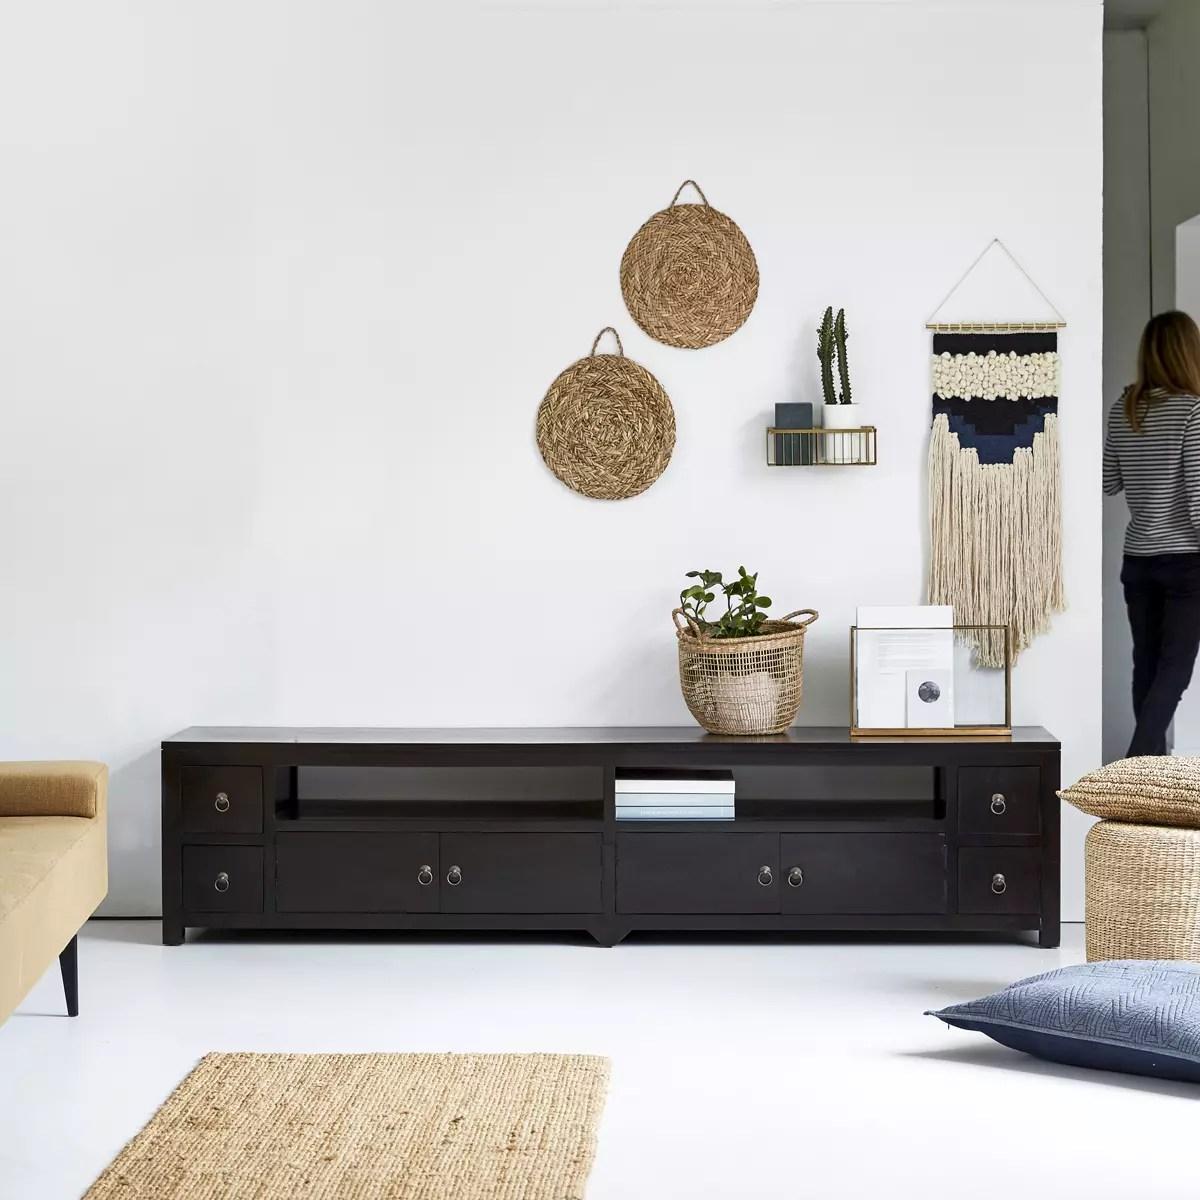 stand brkovi cesto se govori meuble tv 220 cm